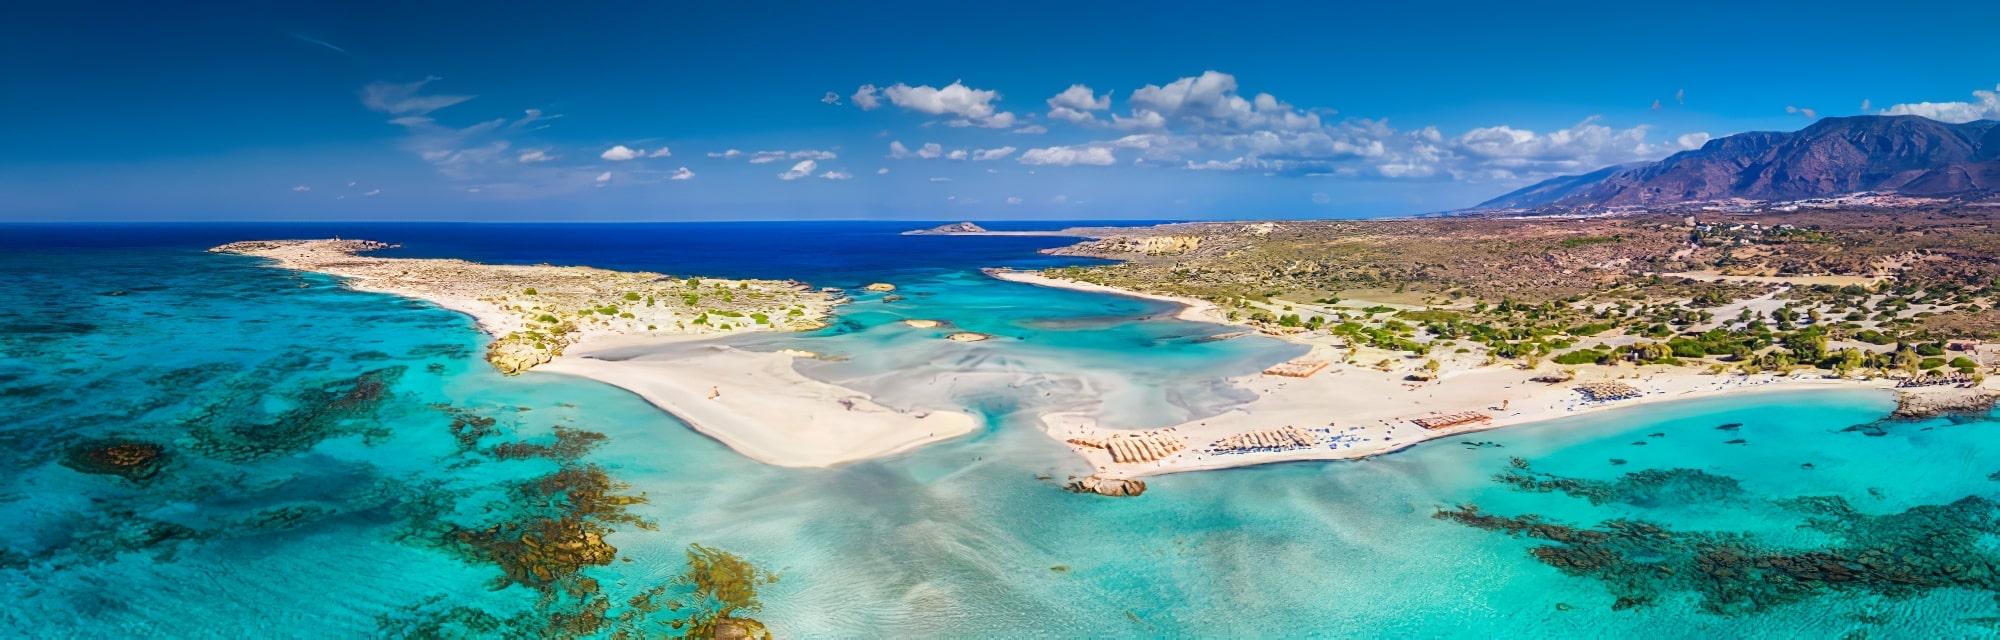 Lagon de Balos, Crète